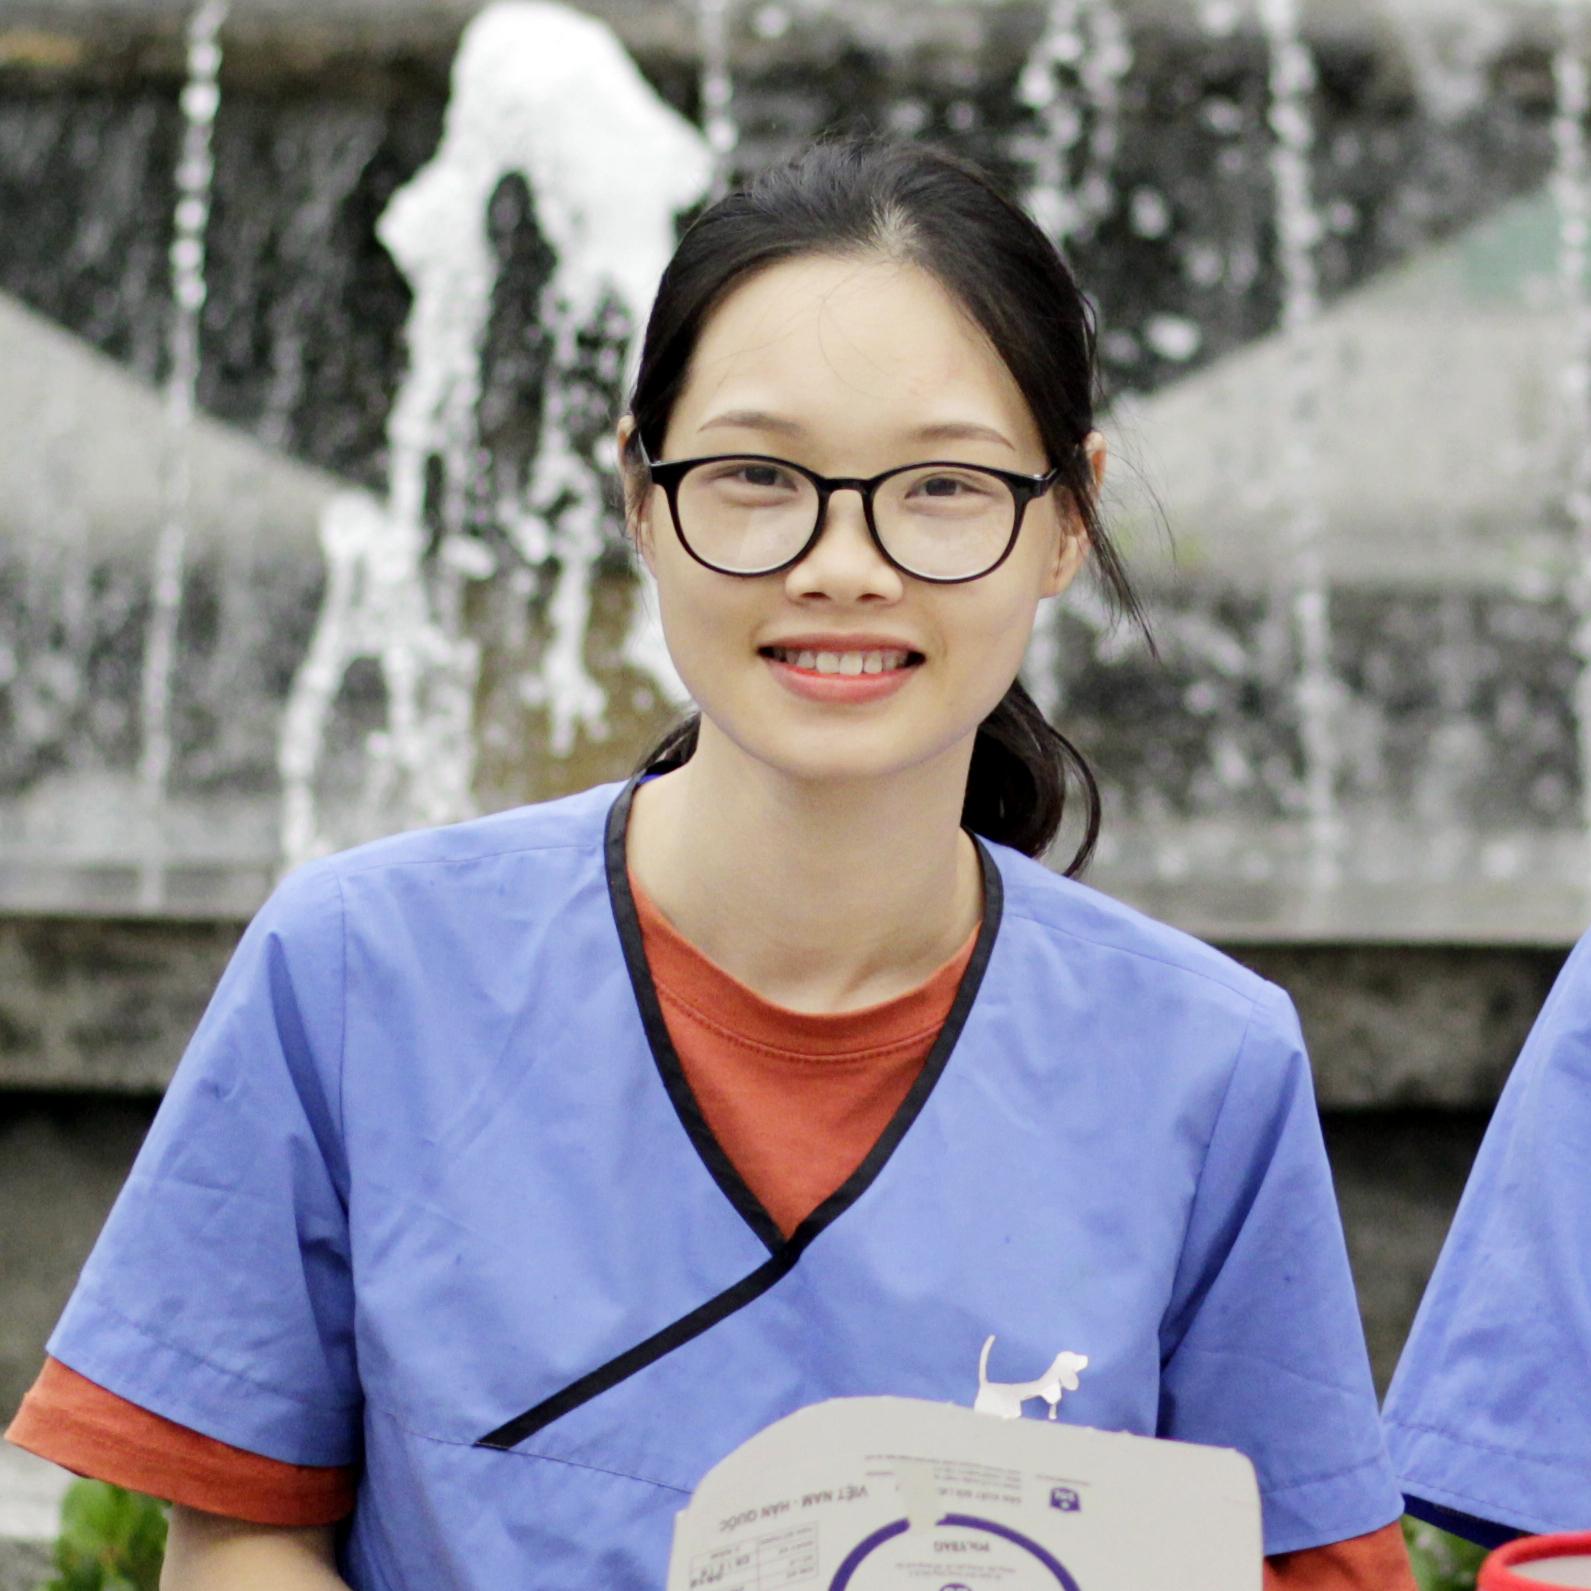 Ms. Ngọc Linh